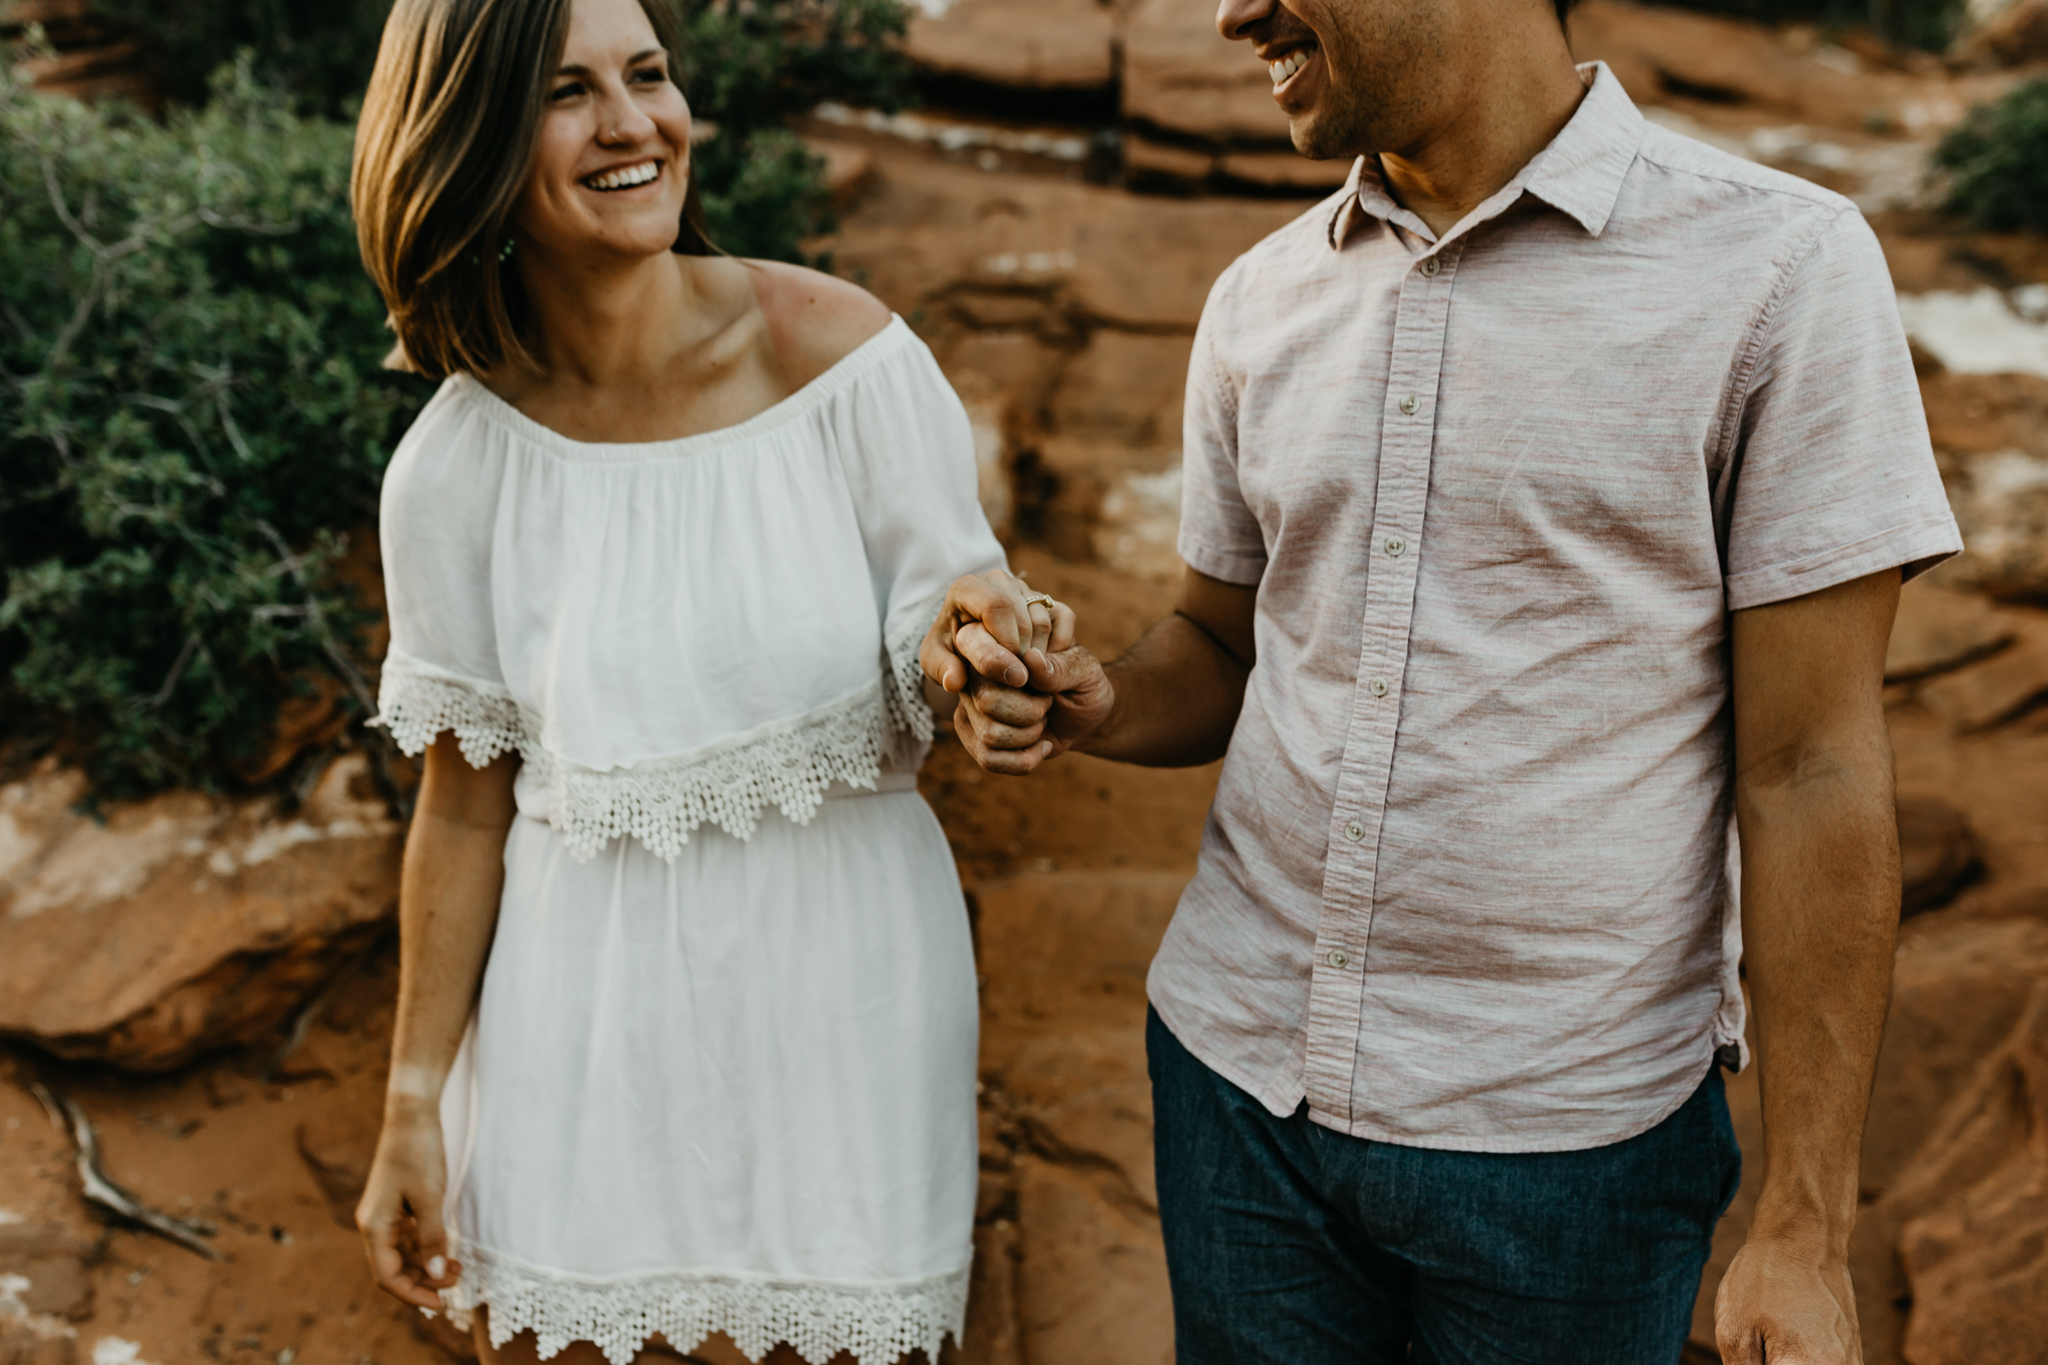 Abby&Austin-Engagement-shoot-Zion-National-Park-8659.jpg